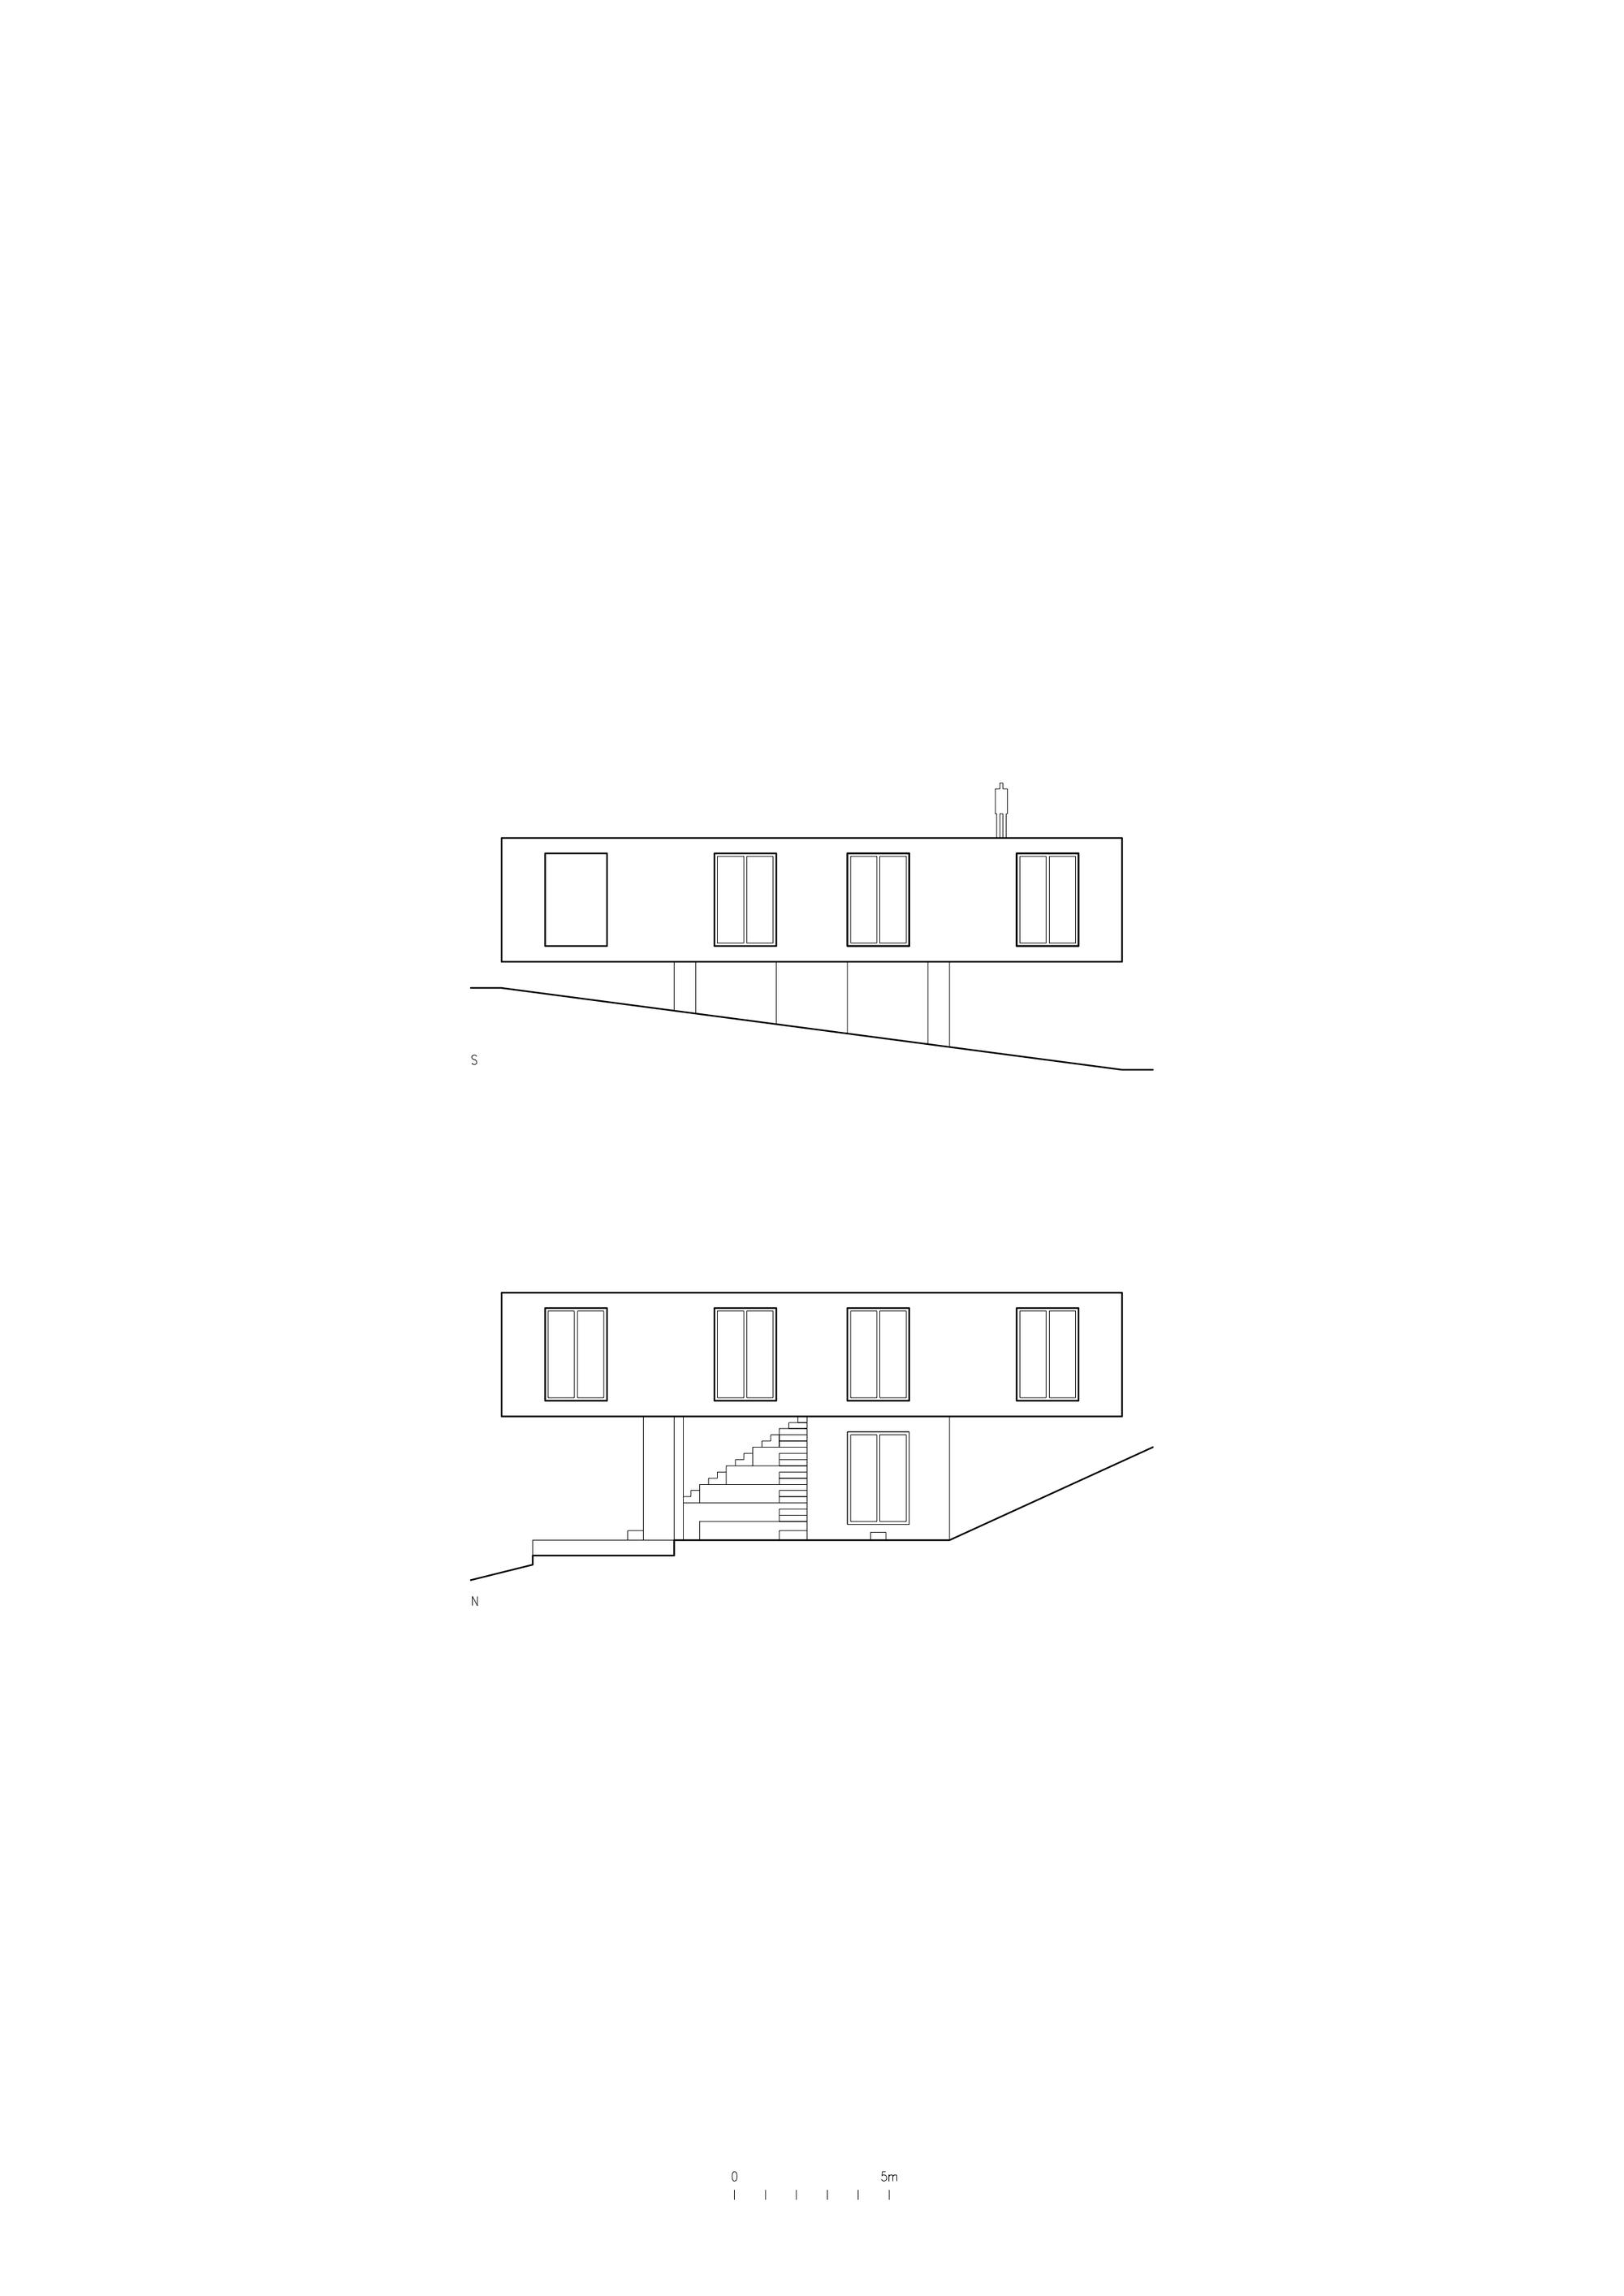 54aaf766e58ecee47e0000ec_guna-house-pezo-von-ellrichshausen_pve_guna_07_elevations